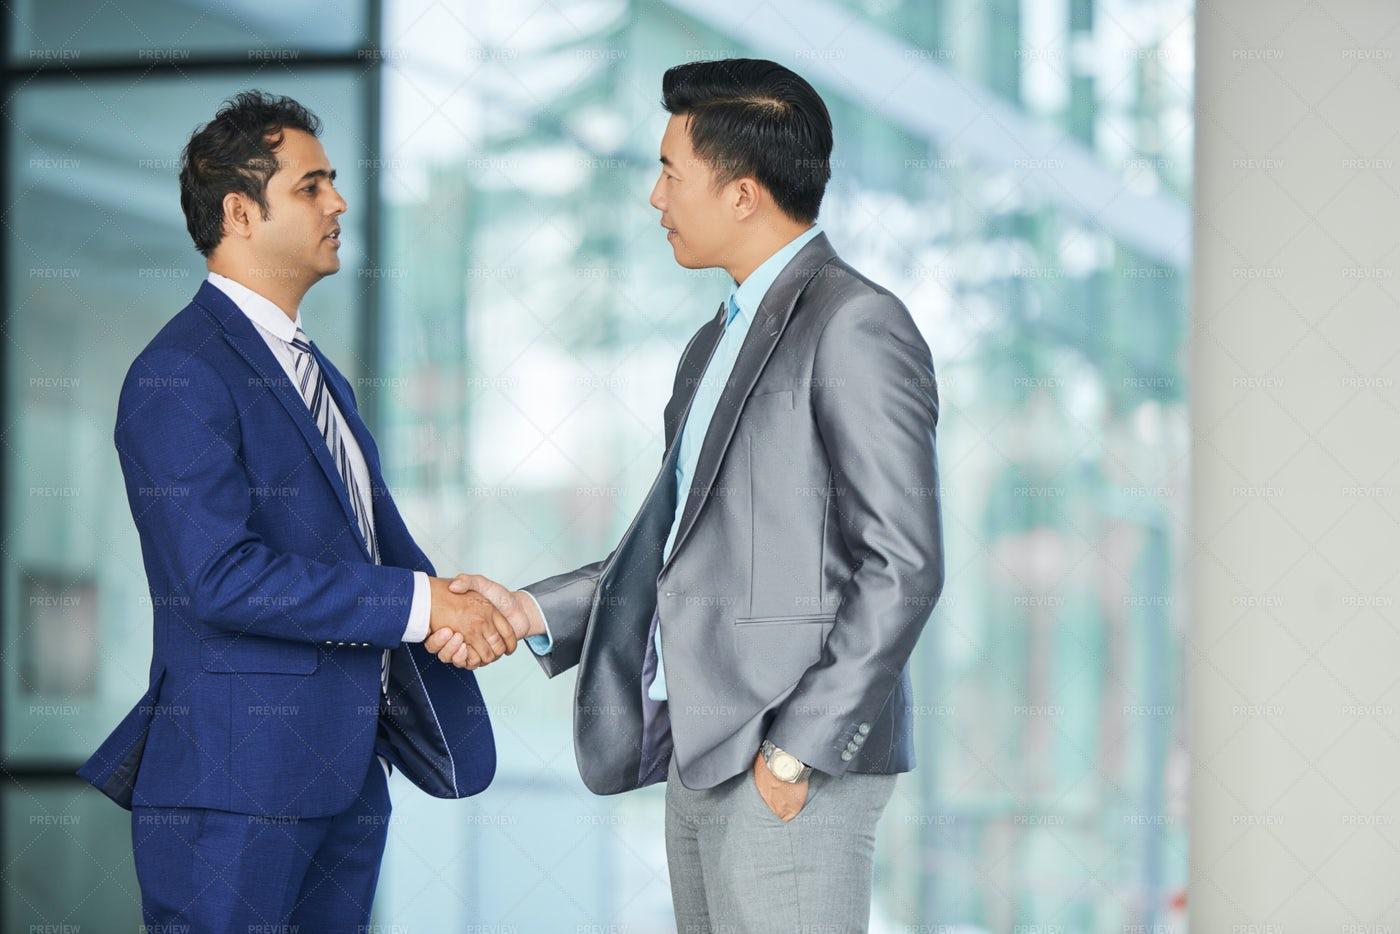 Businessmen Shaking Hands: Stock Photos